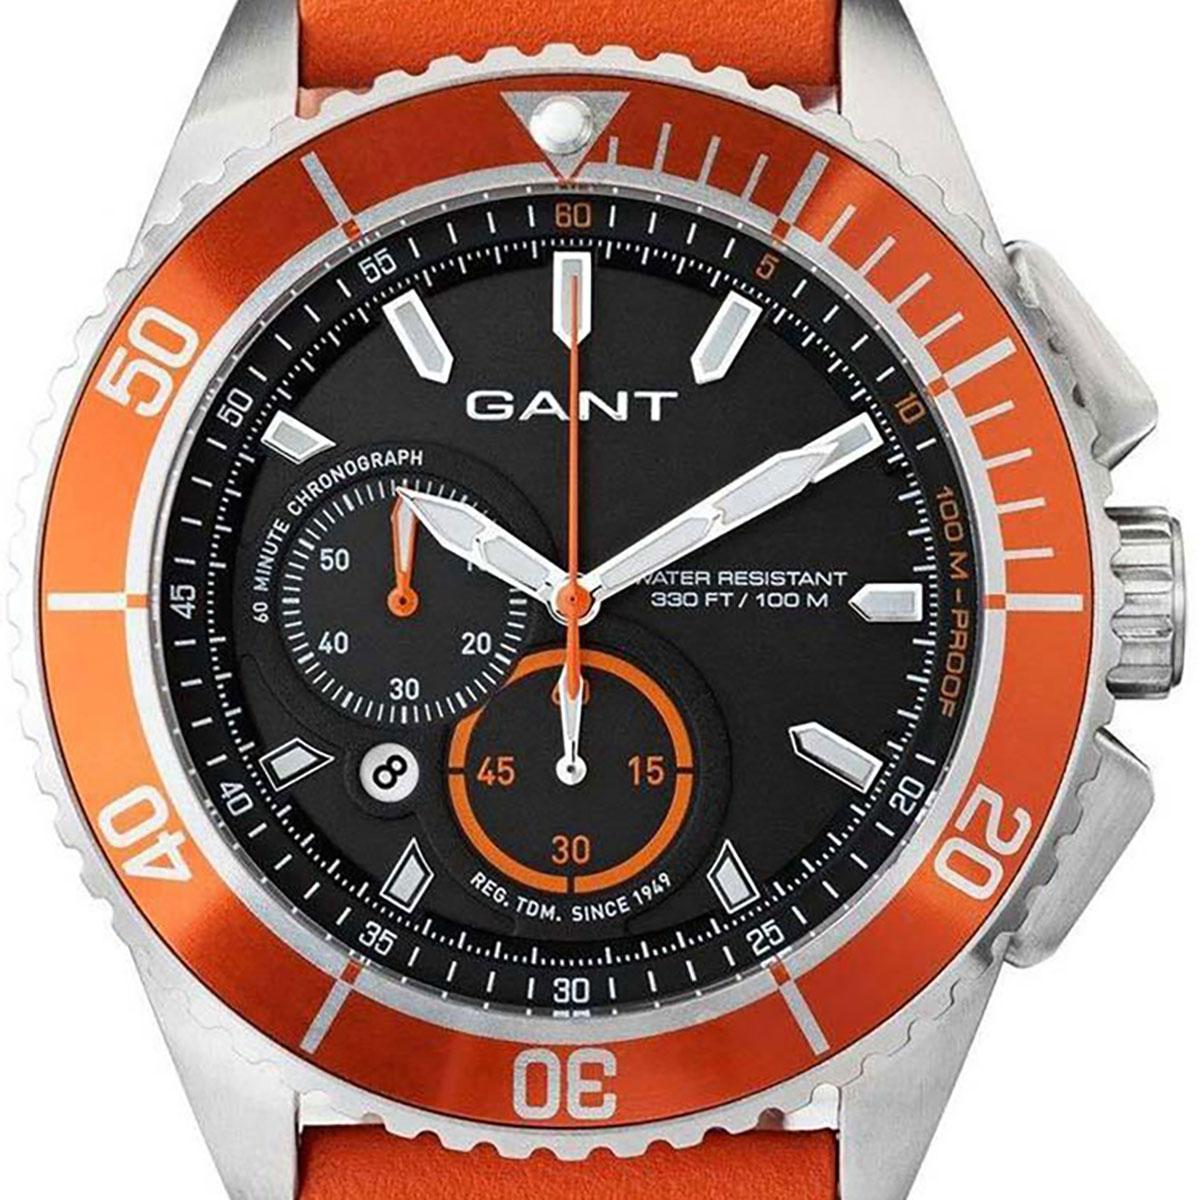 GANT ガント 電池式クォーツ 腕時計 [W70545] 並行輸入品 ブラック(黒)